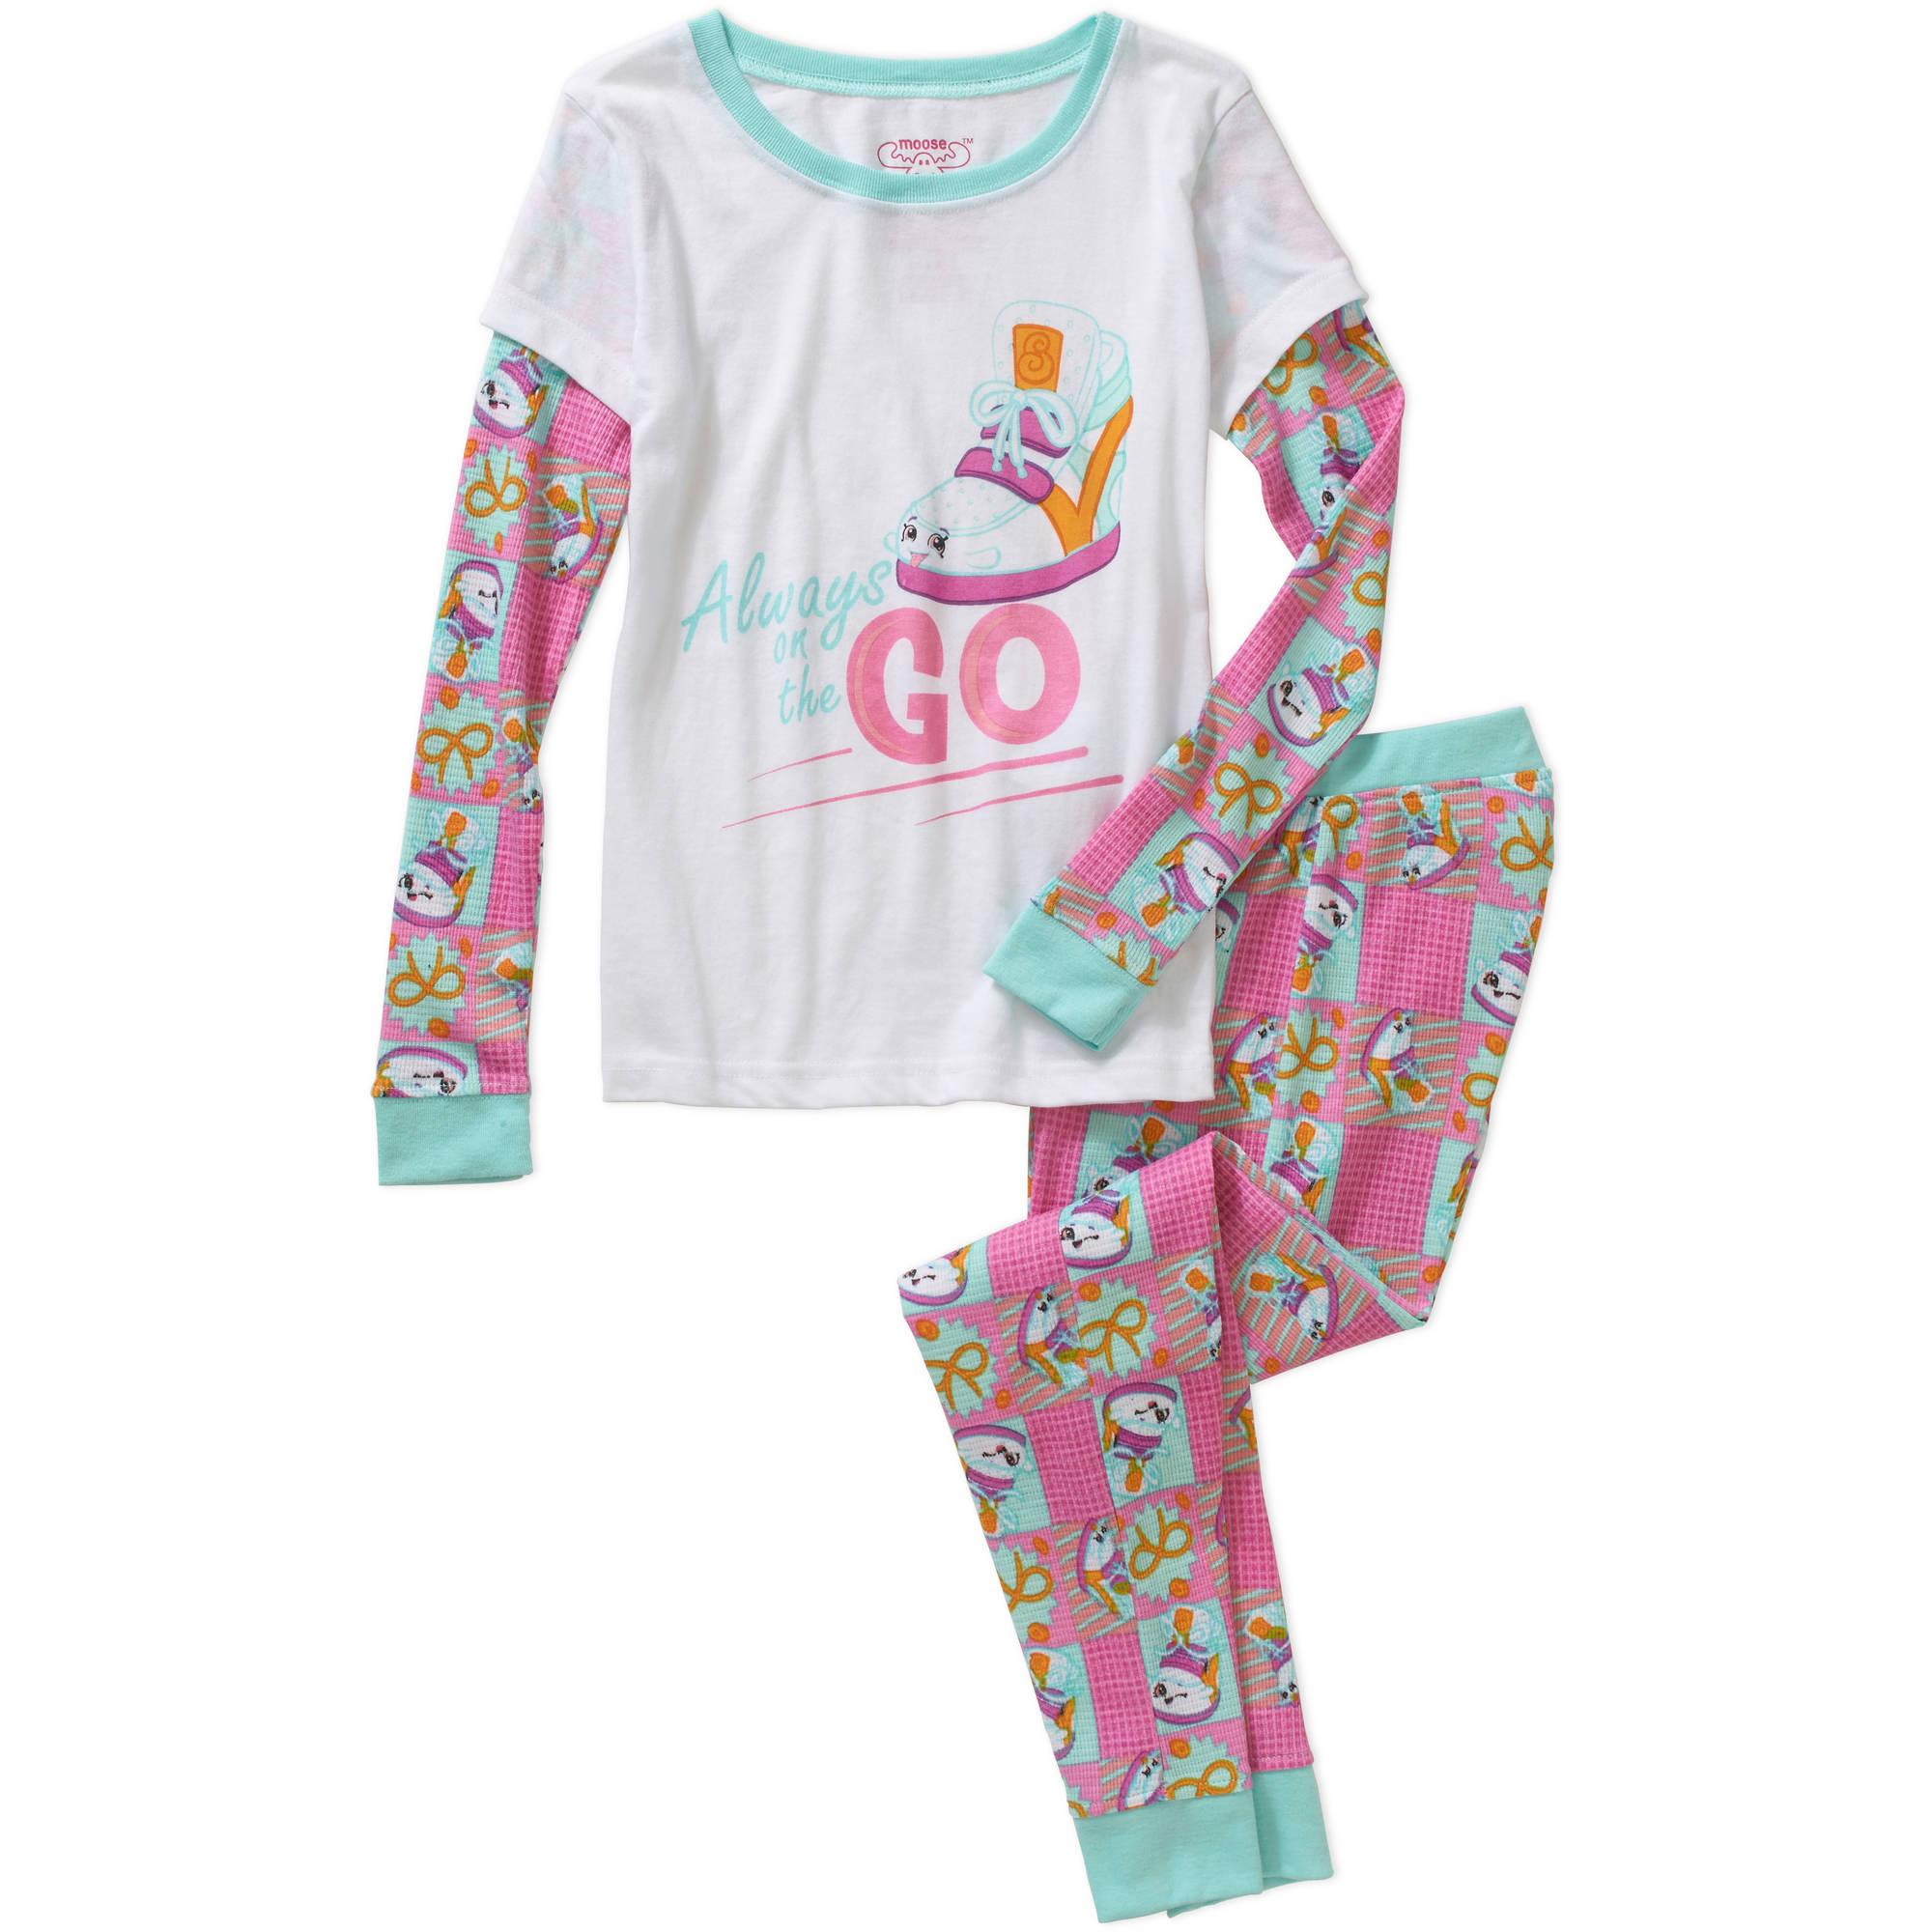 Shopkins Girls' Long Sleeve Wedge Waffle Top and Pant Sleepwear Set